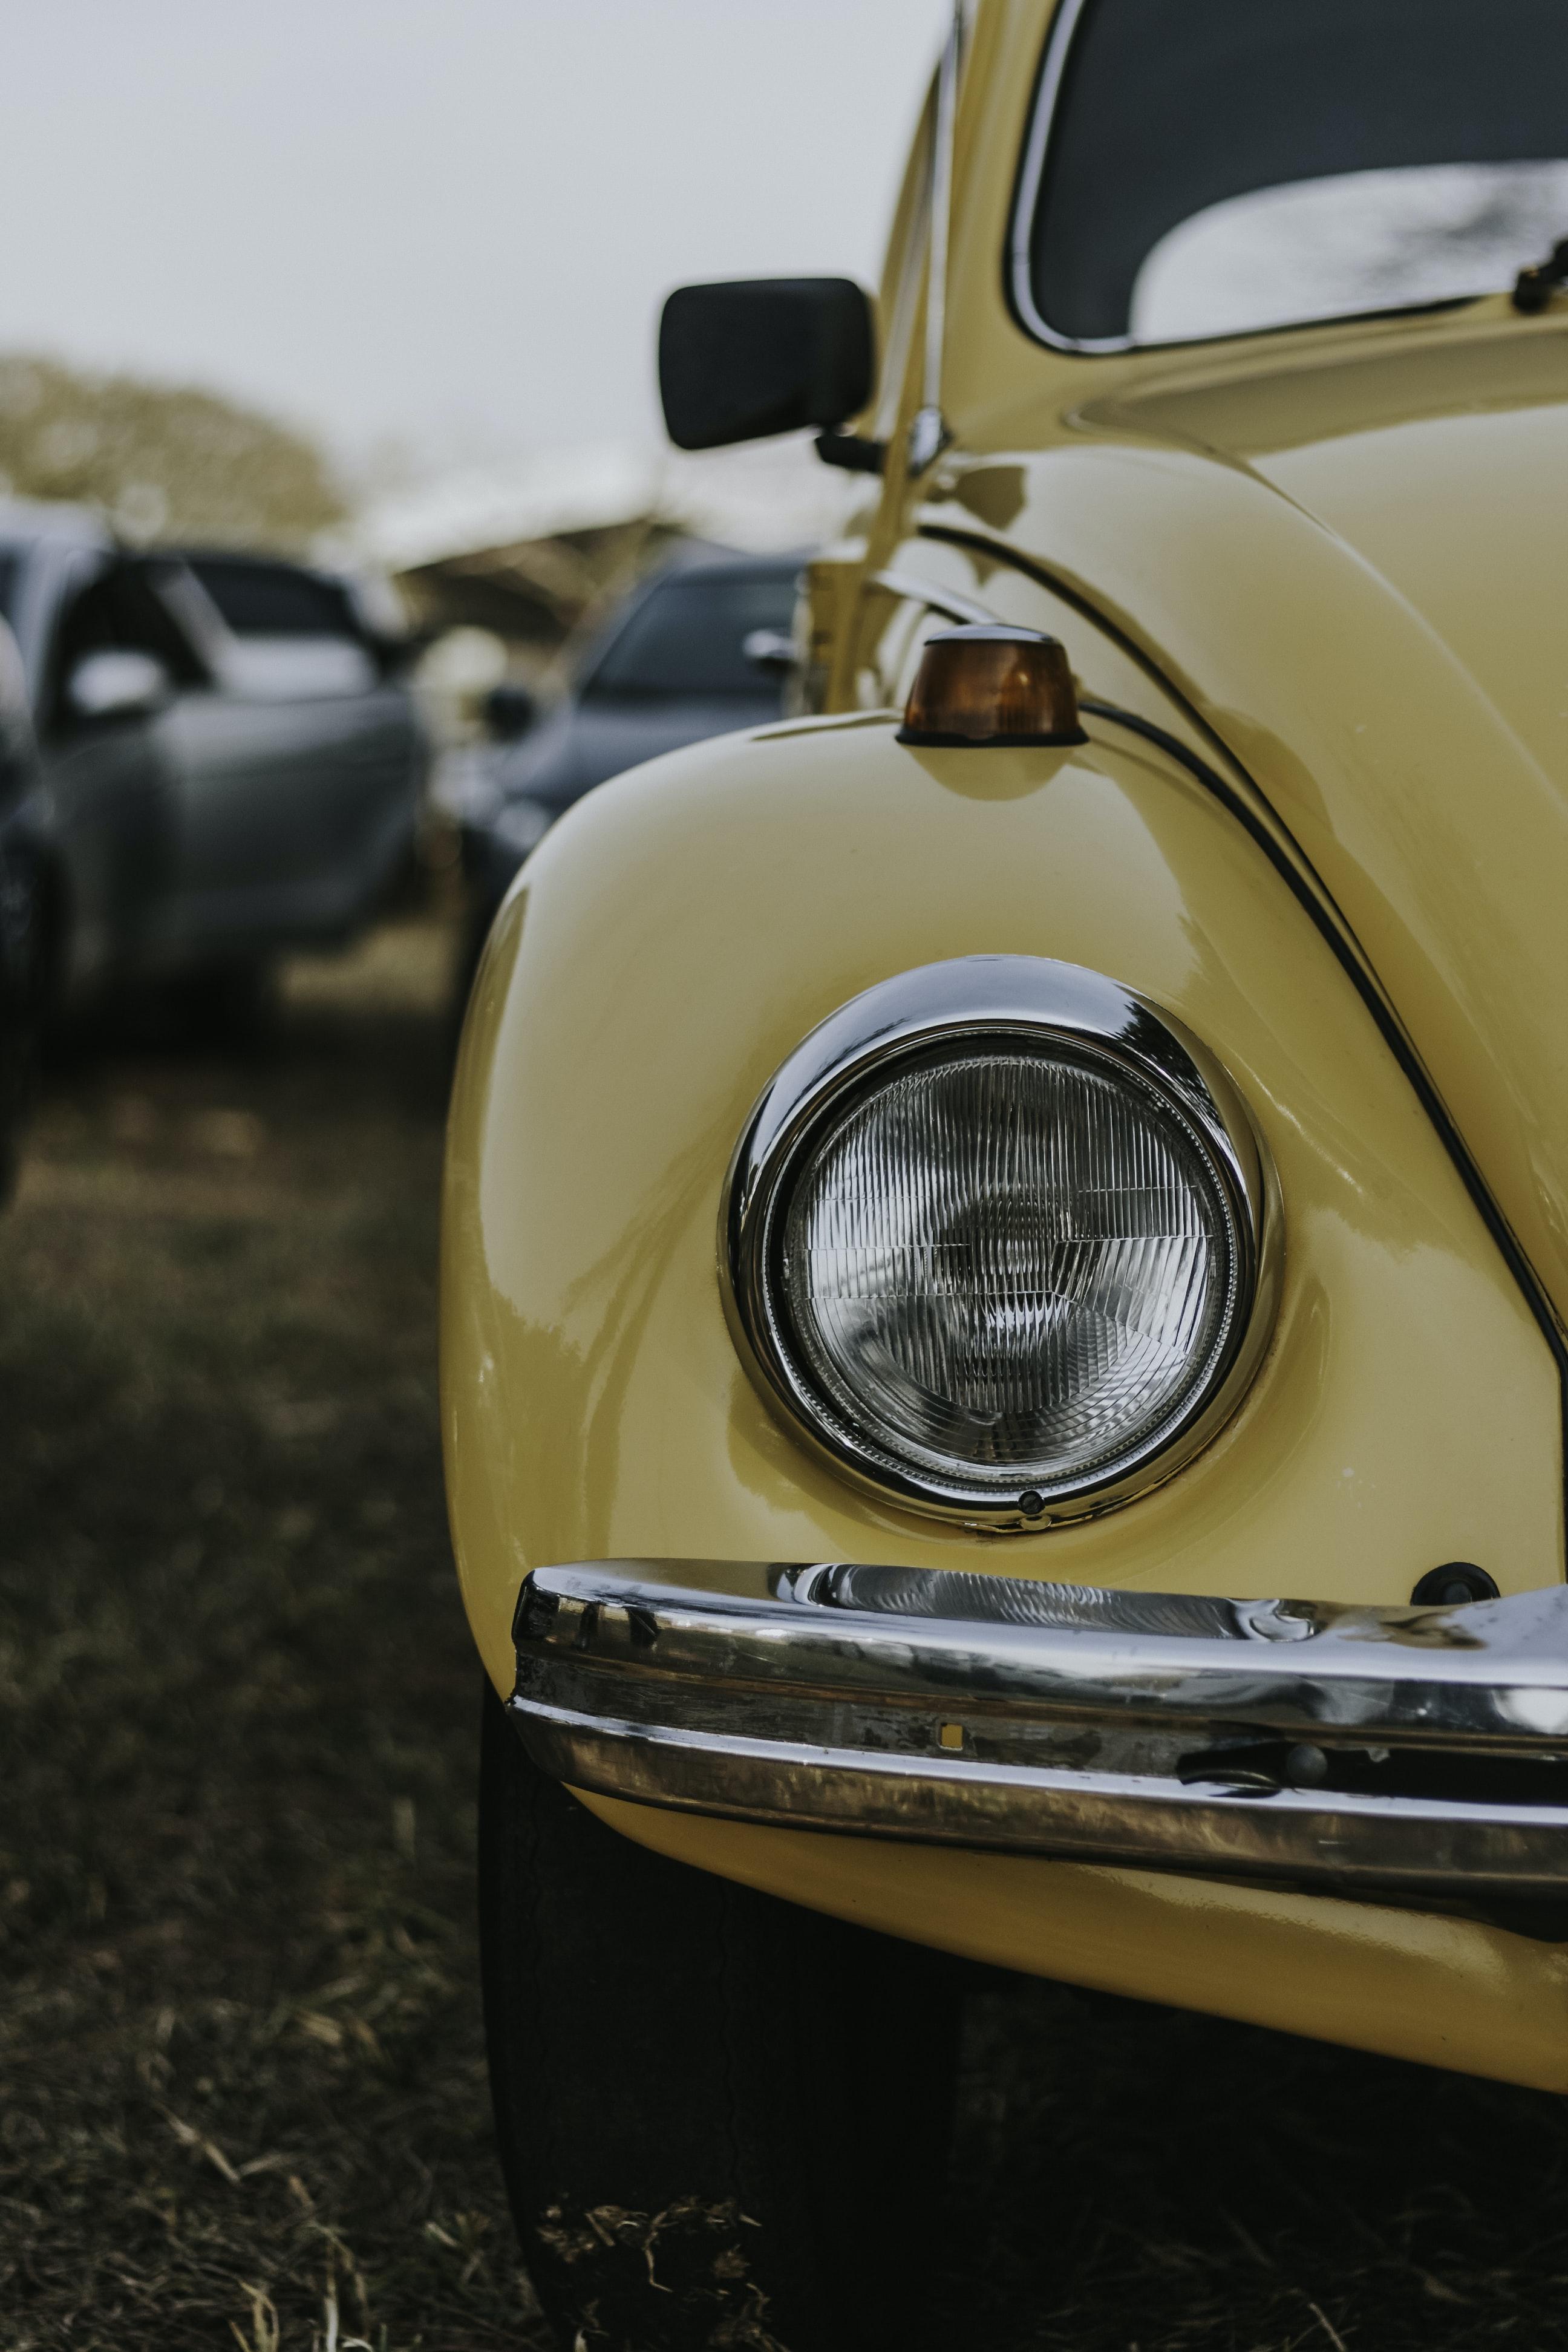 Vw Beetle Pictures Download Free Images On Unsplash